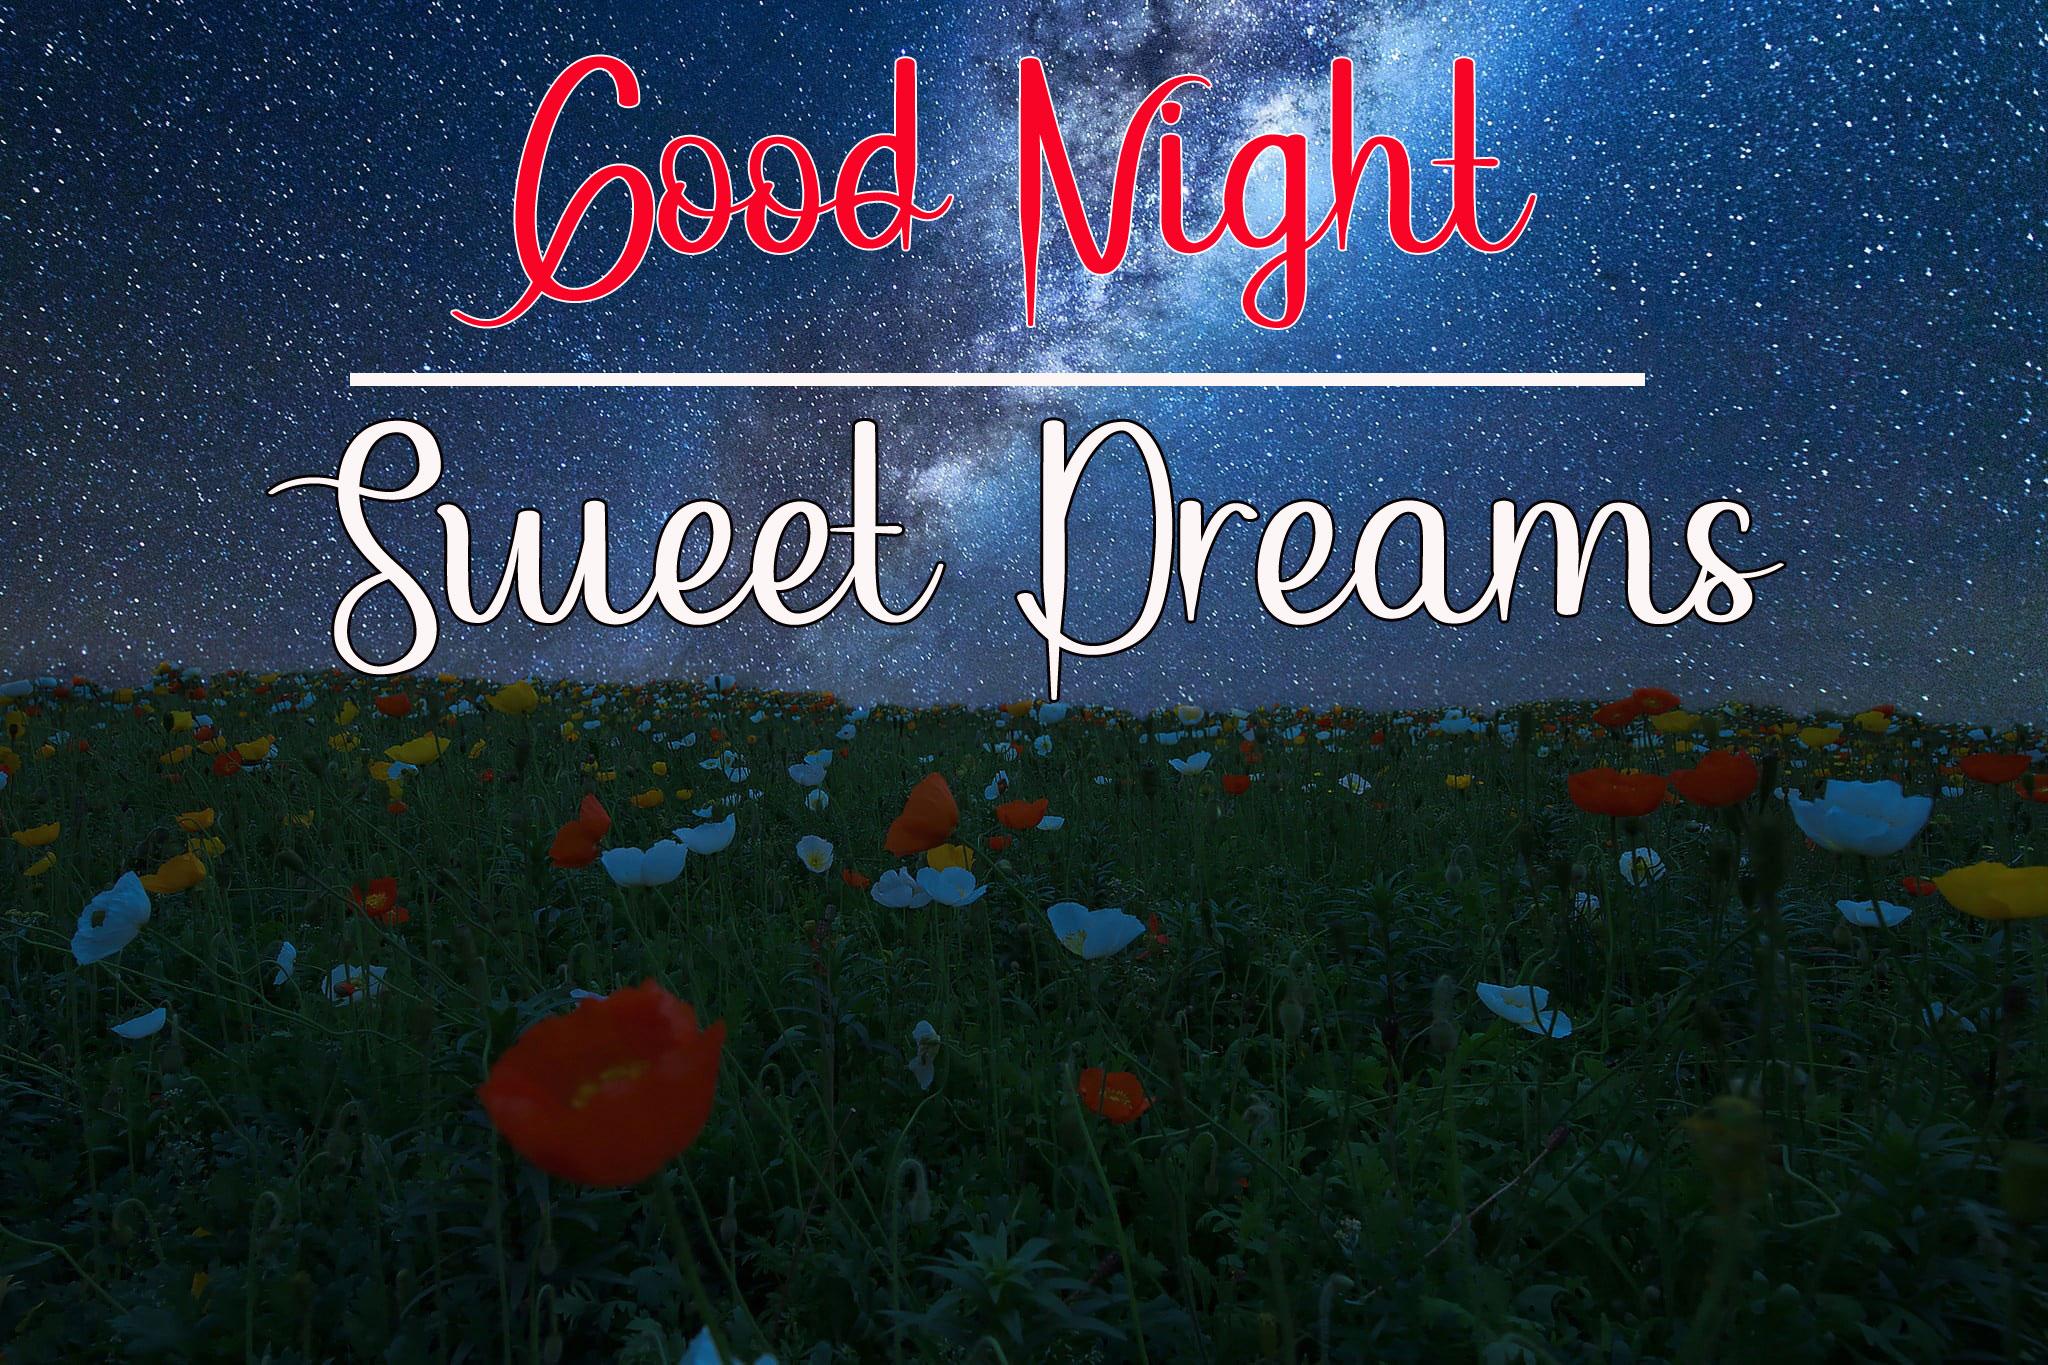 Beautiful New Good Night Images pics photo free hd download